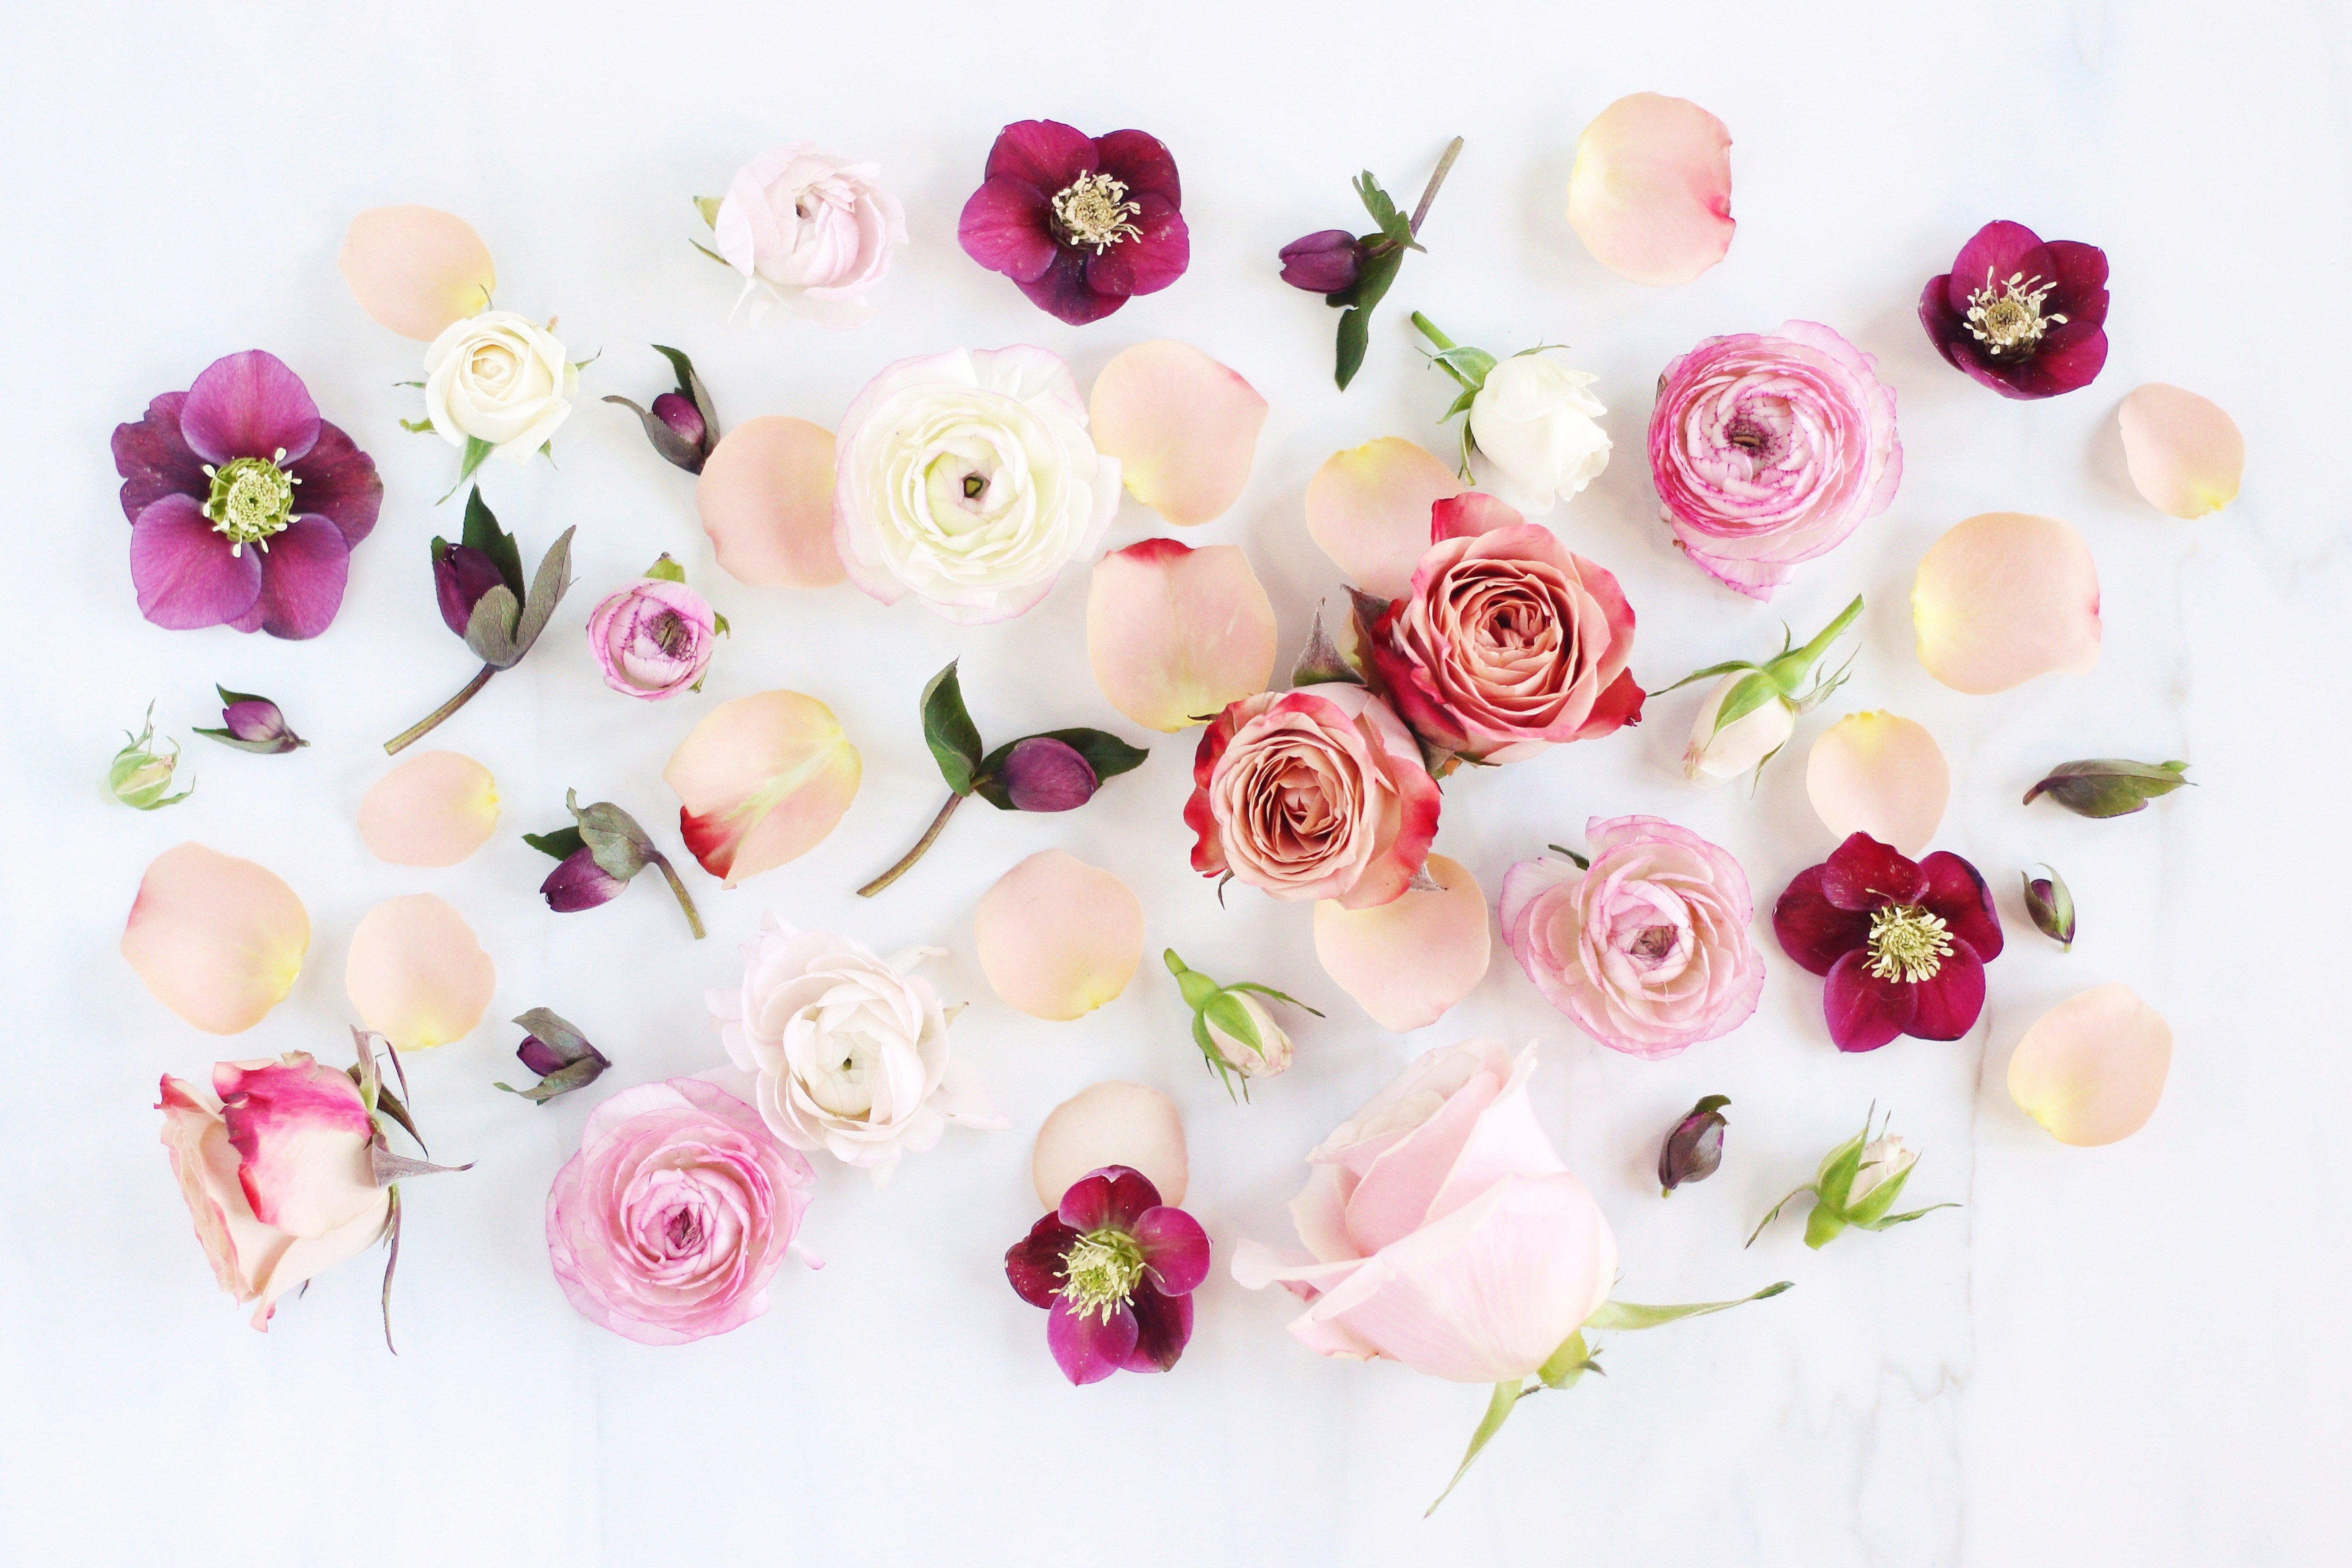 Aesthetic Floral Desktop Wallpapers Wallpaper Cave